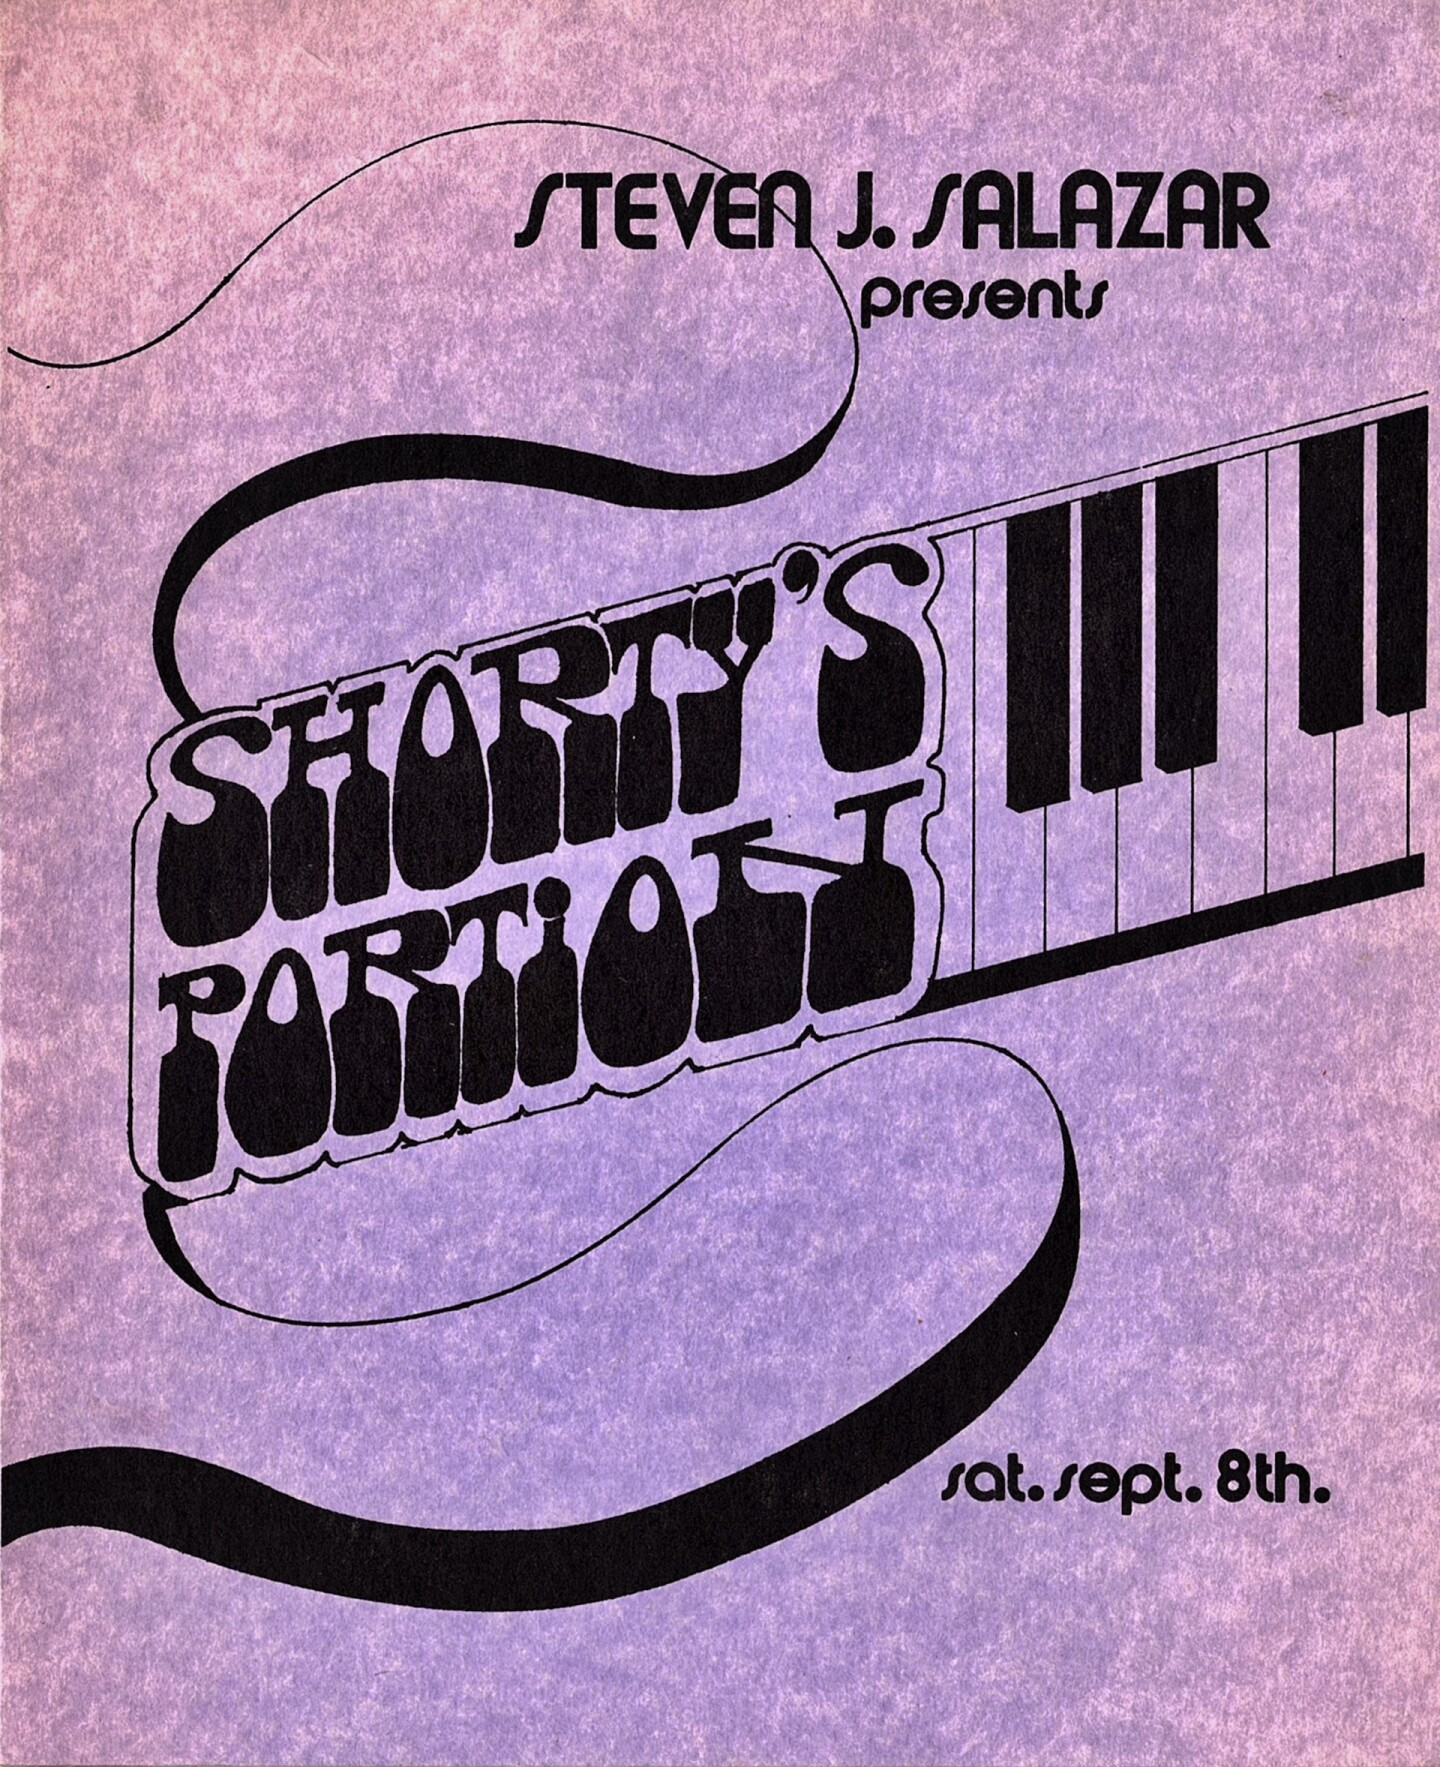 Program cover for Steven J. Salazar's 1973 San Gabriel Civic Auditorium performance.